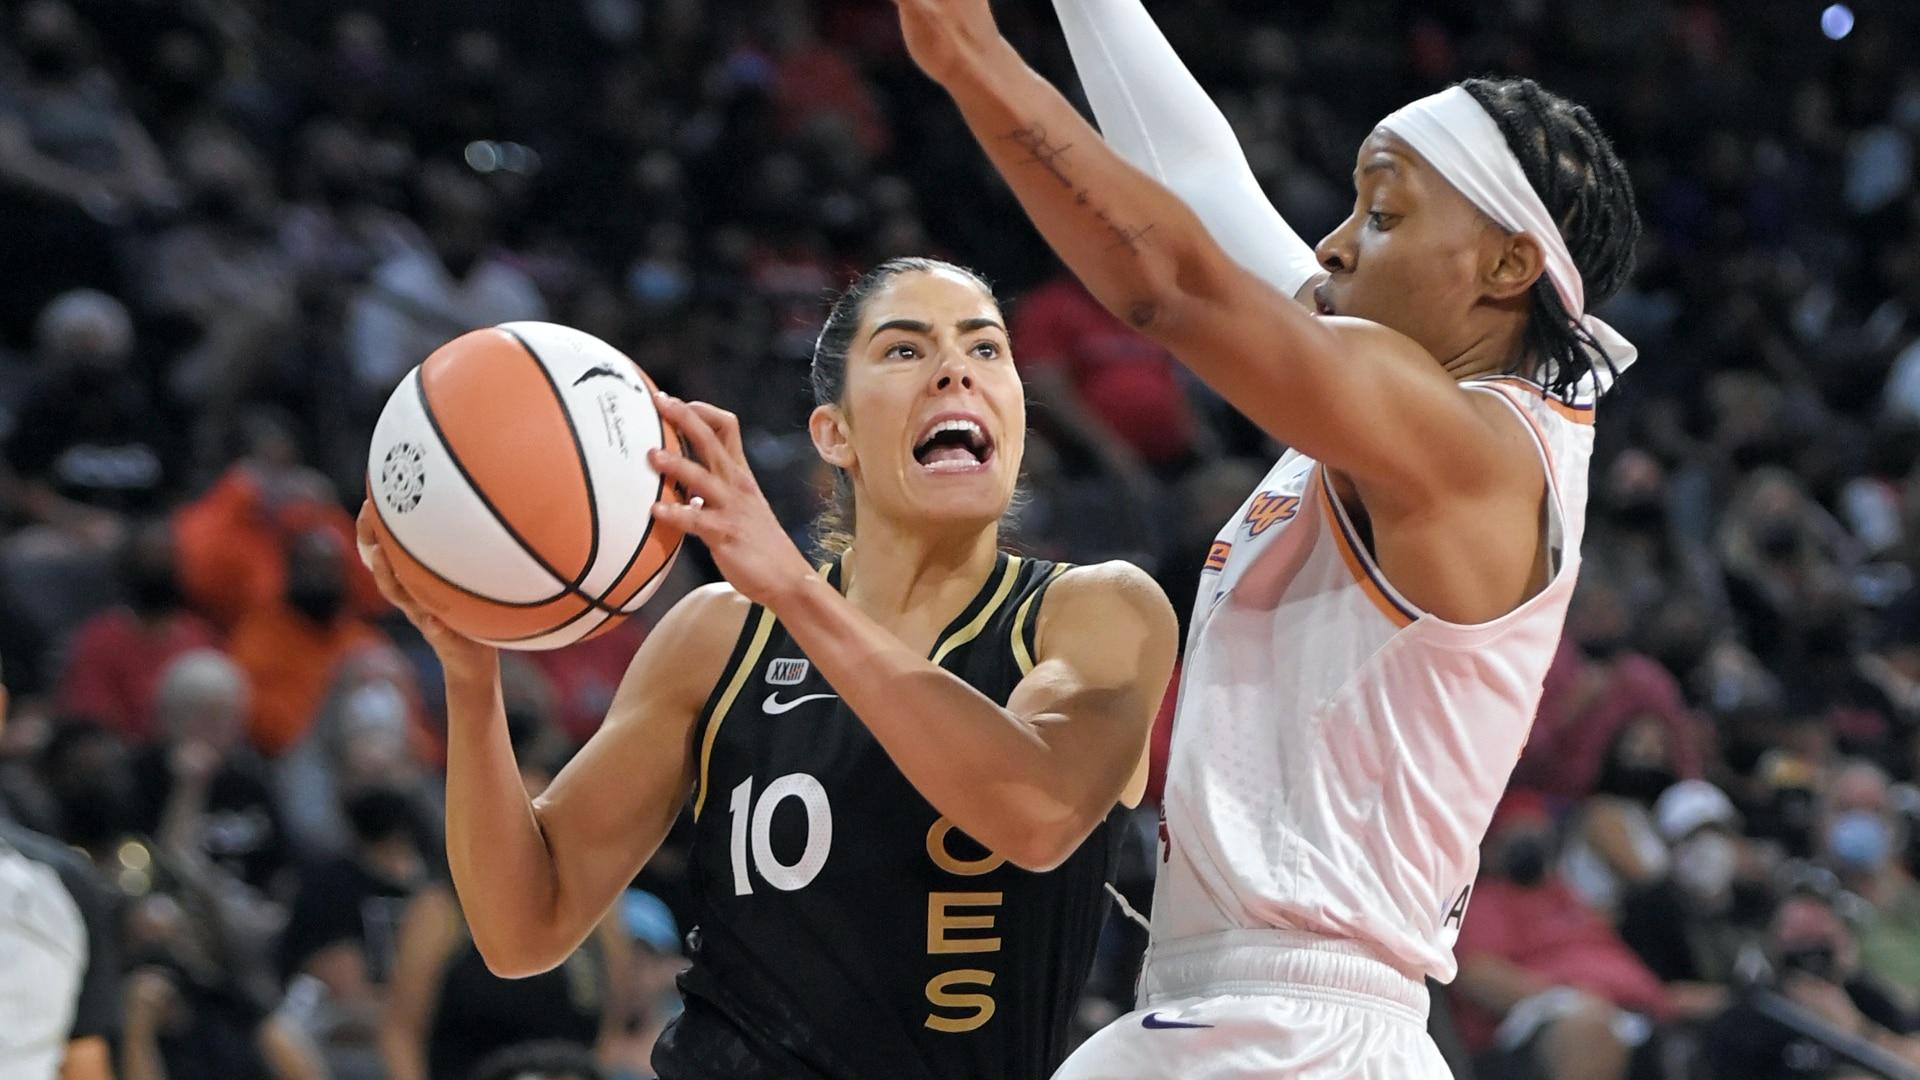 WNBA playoffs: Aces, Sky seek upper hand in semis